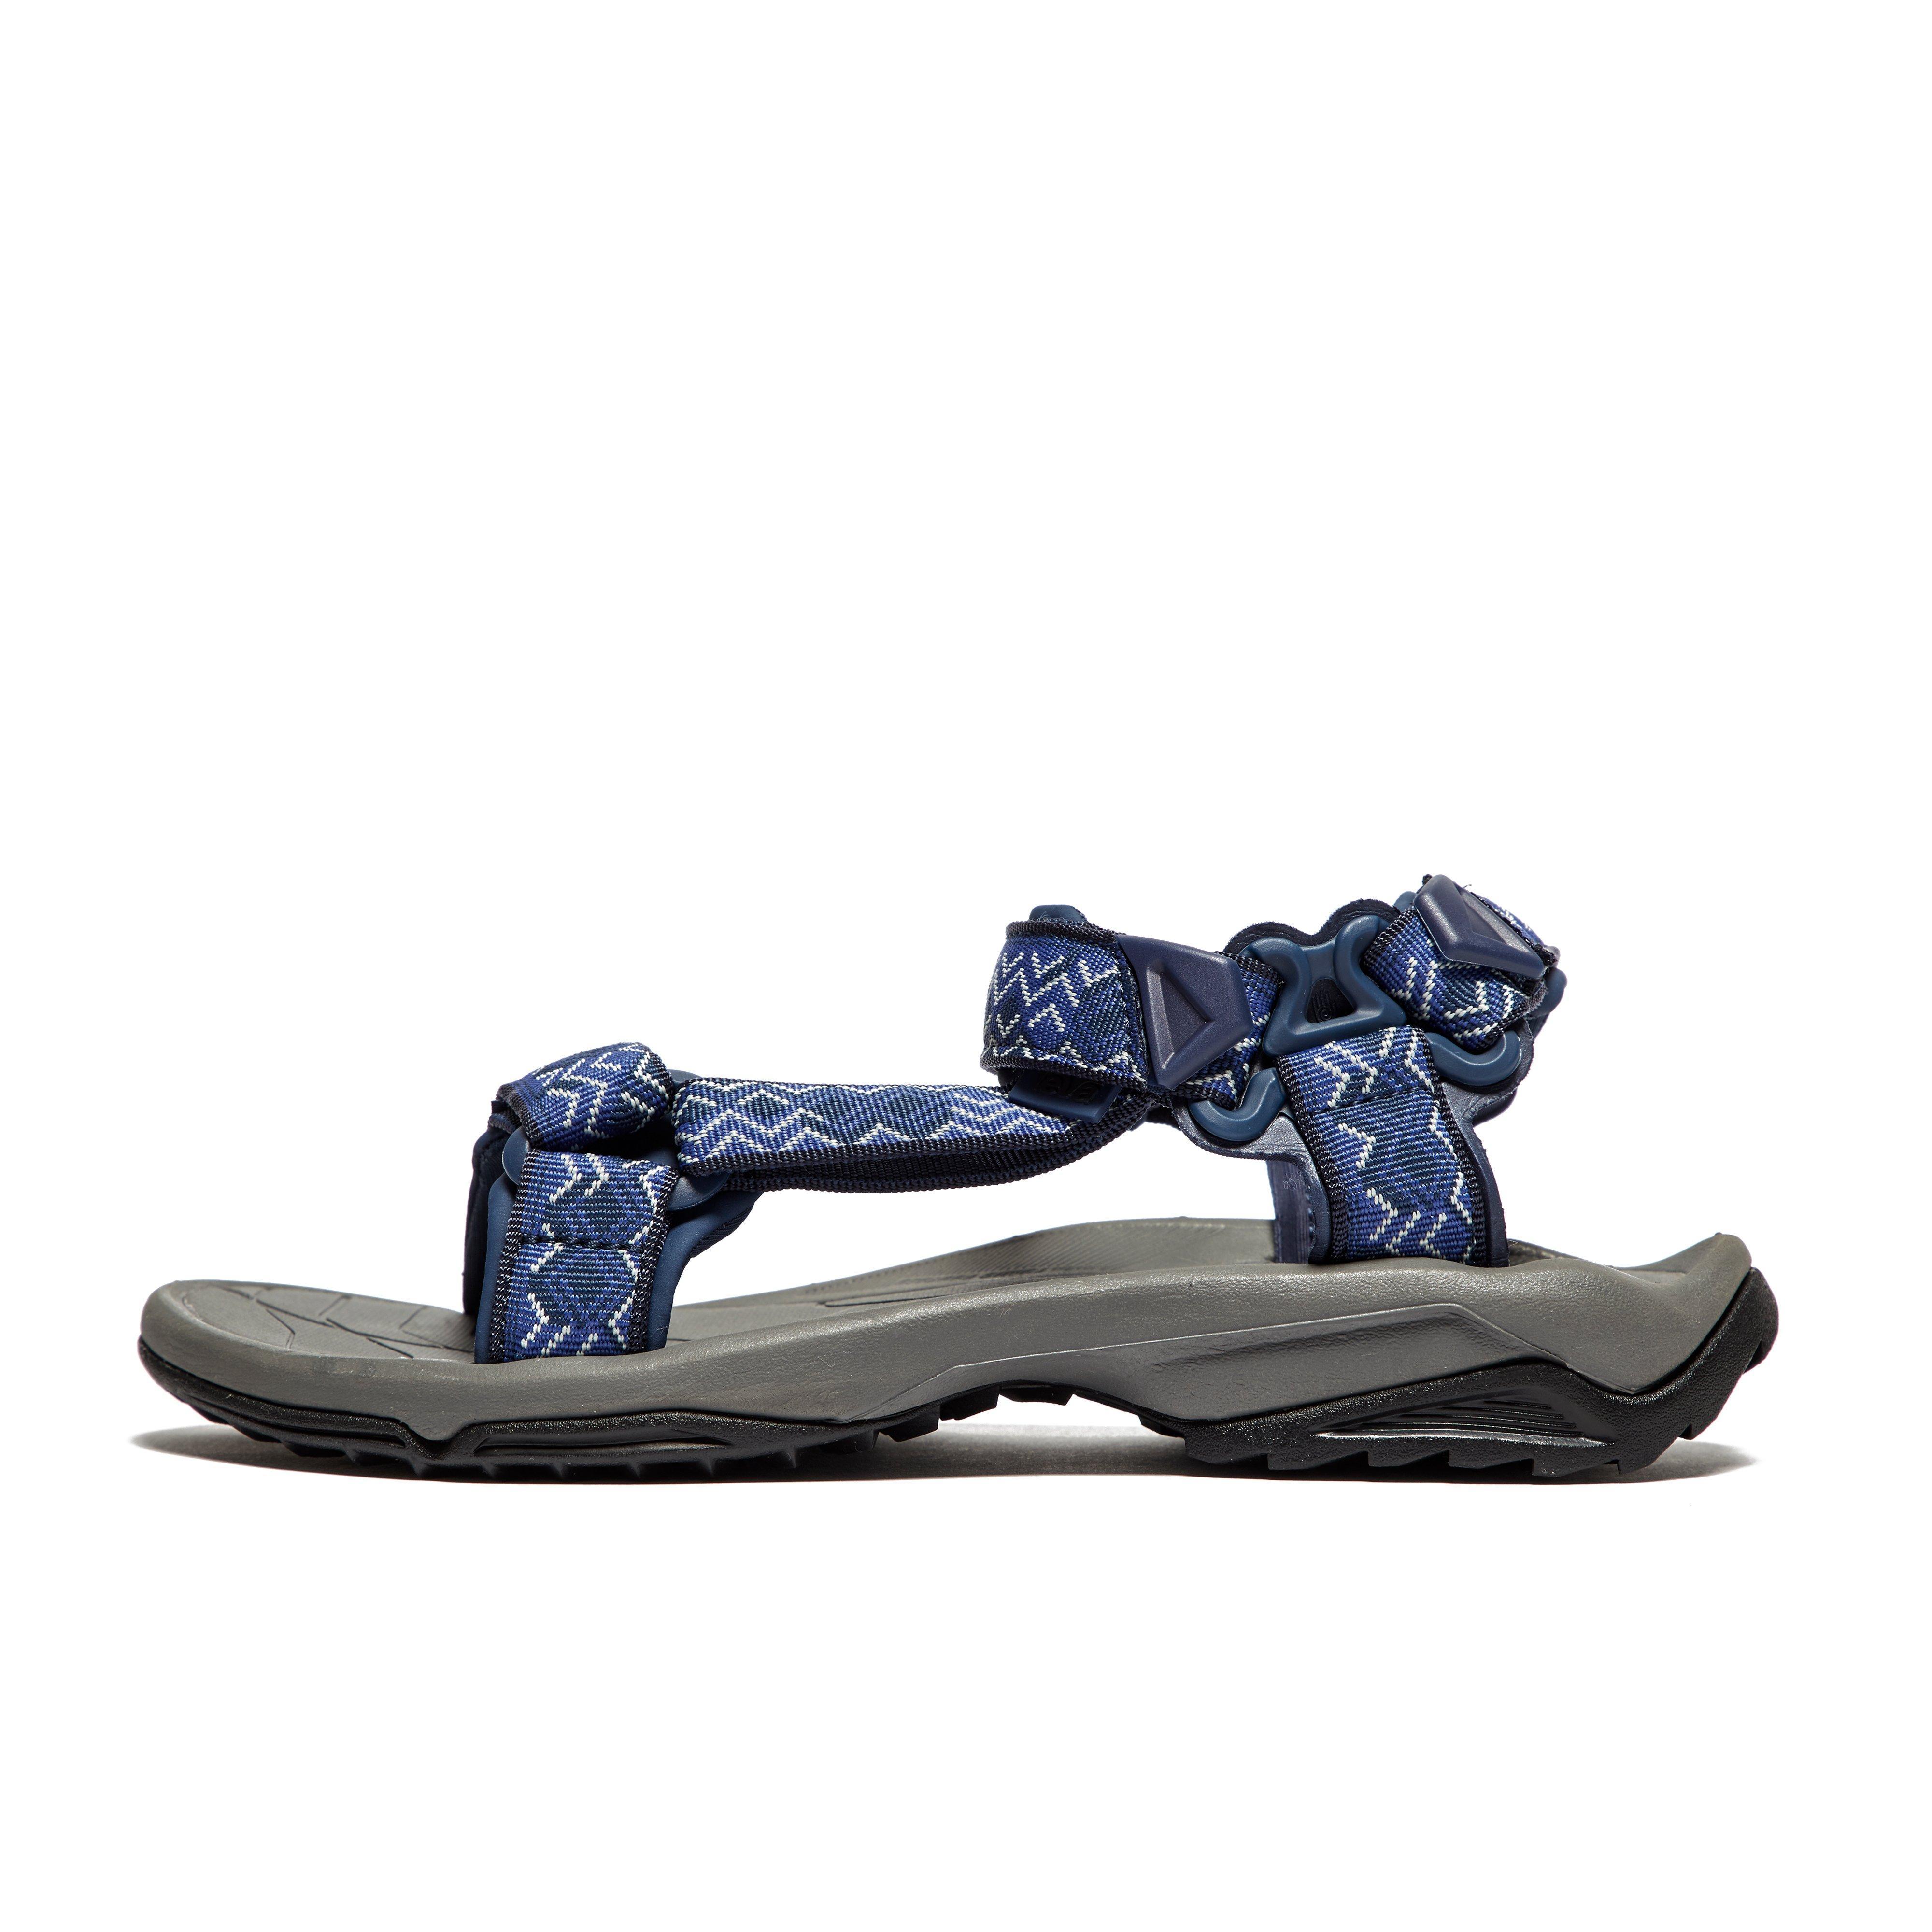 f2518a84b7b58 Details about Teva Terra Fi Lite Men s Walking Sandals